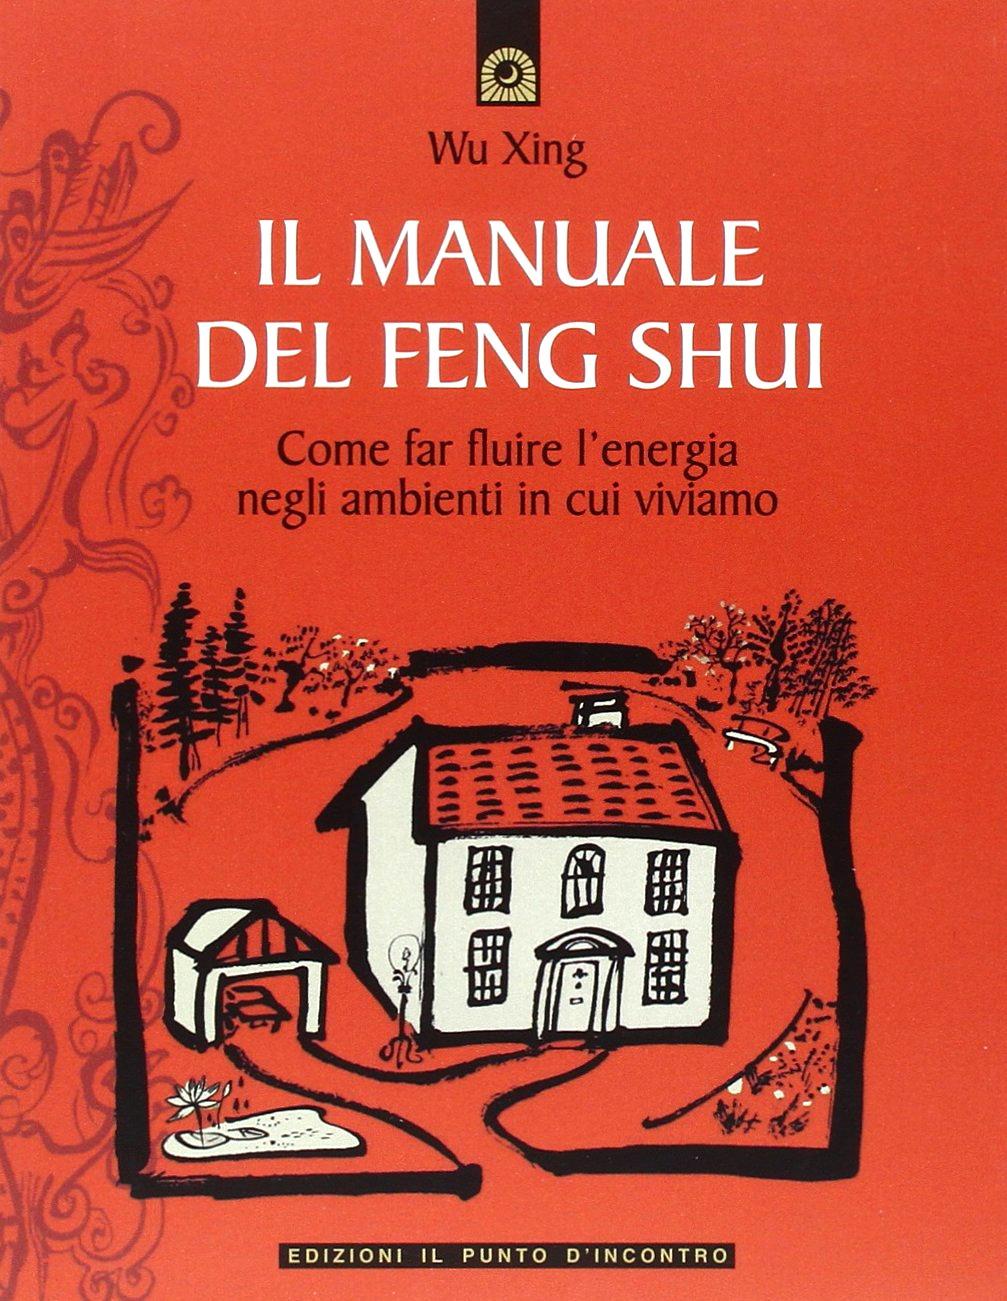 Recensione di Il Manuale del Feng Shui – Wu Xing